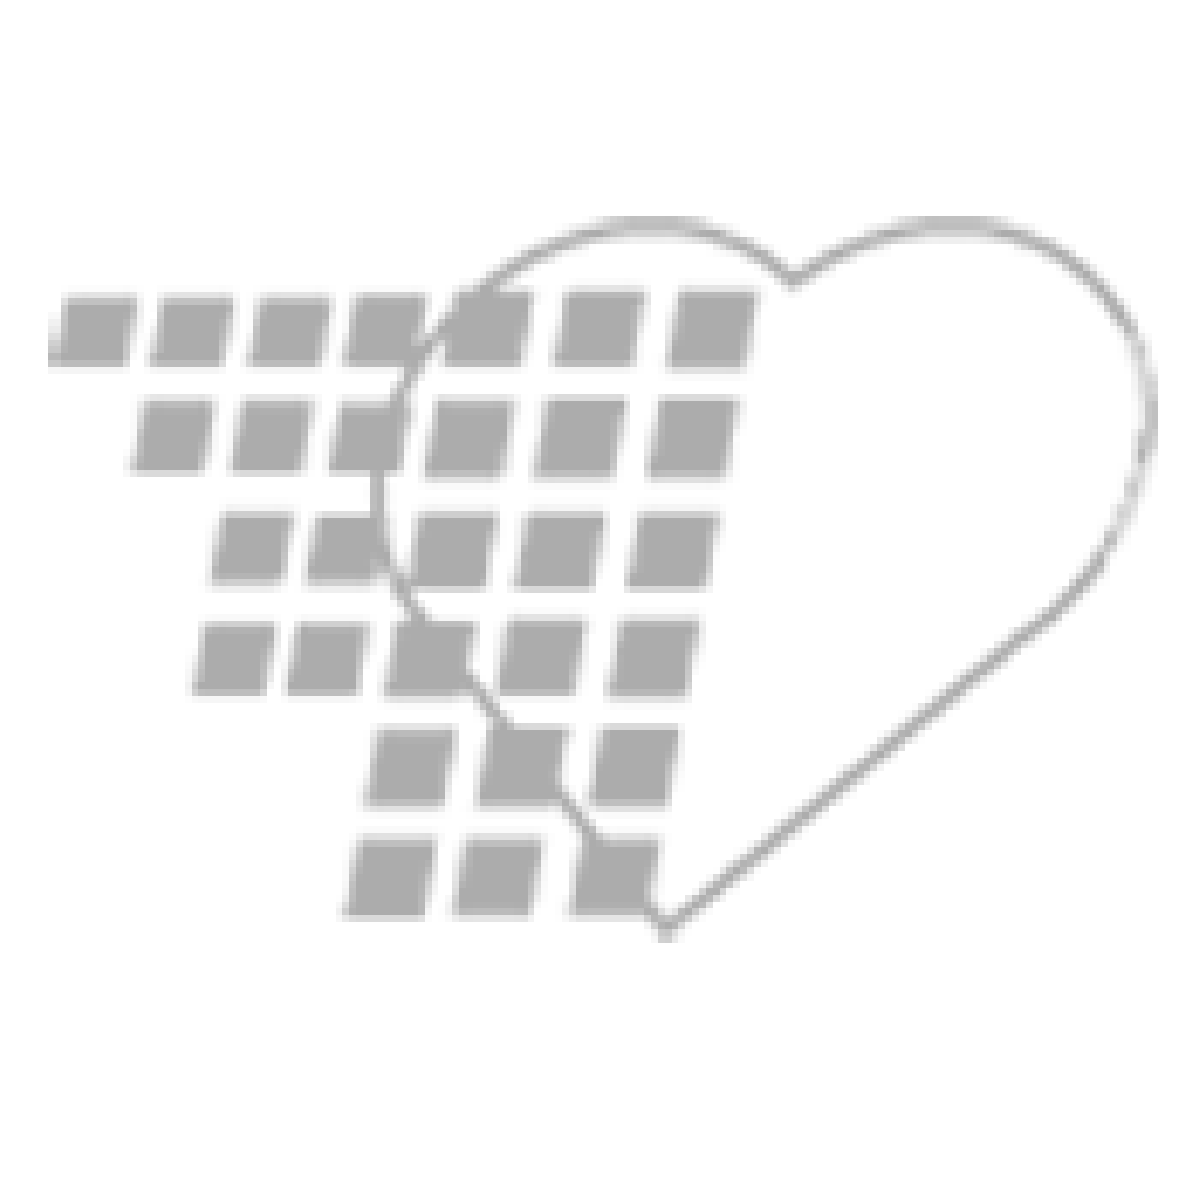 06-44-2500 DuoDote® Auto Injector Trainer